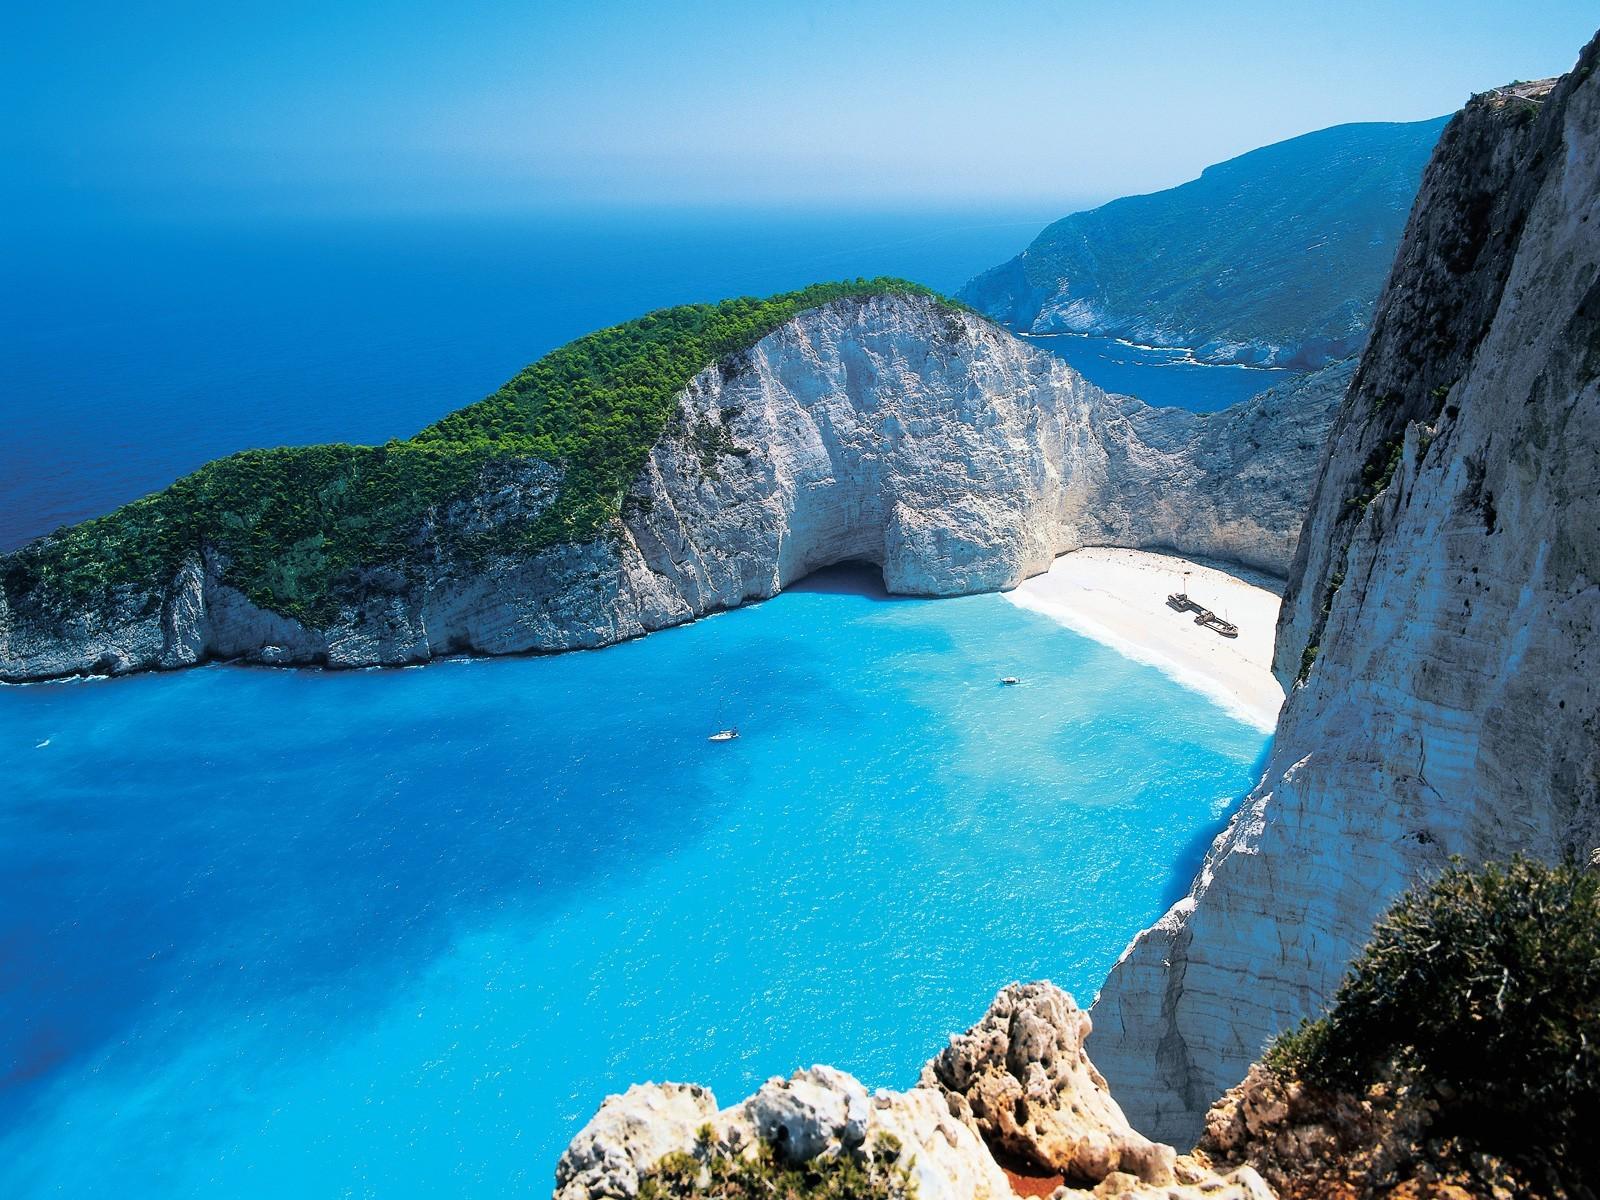 Wallpaper : landscape, mountains, boat, sea, bay, nature ...